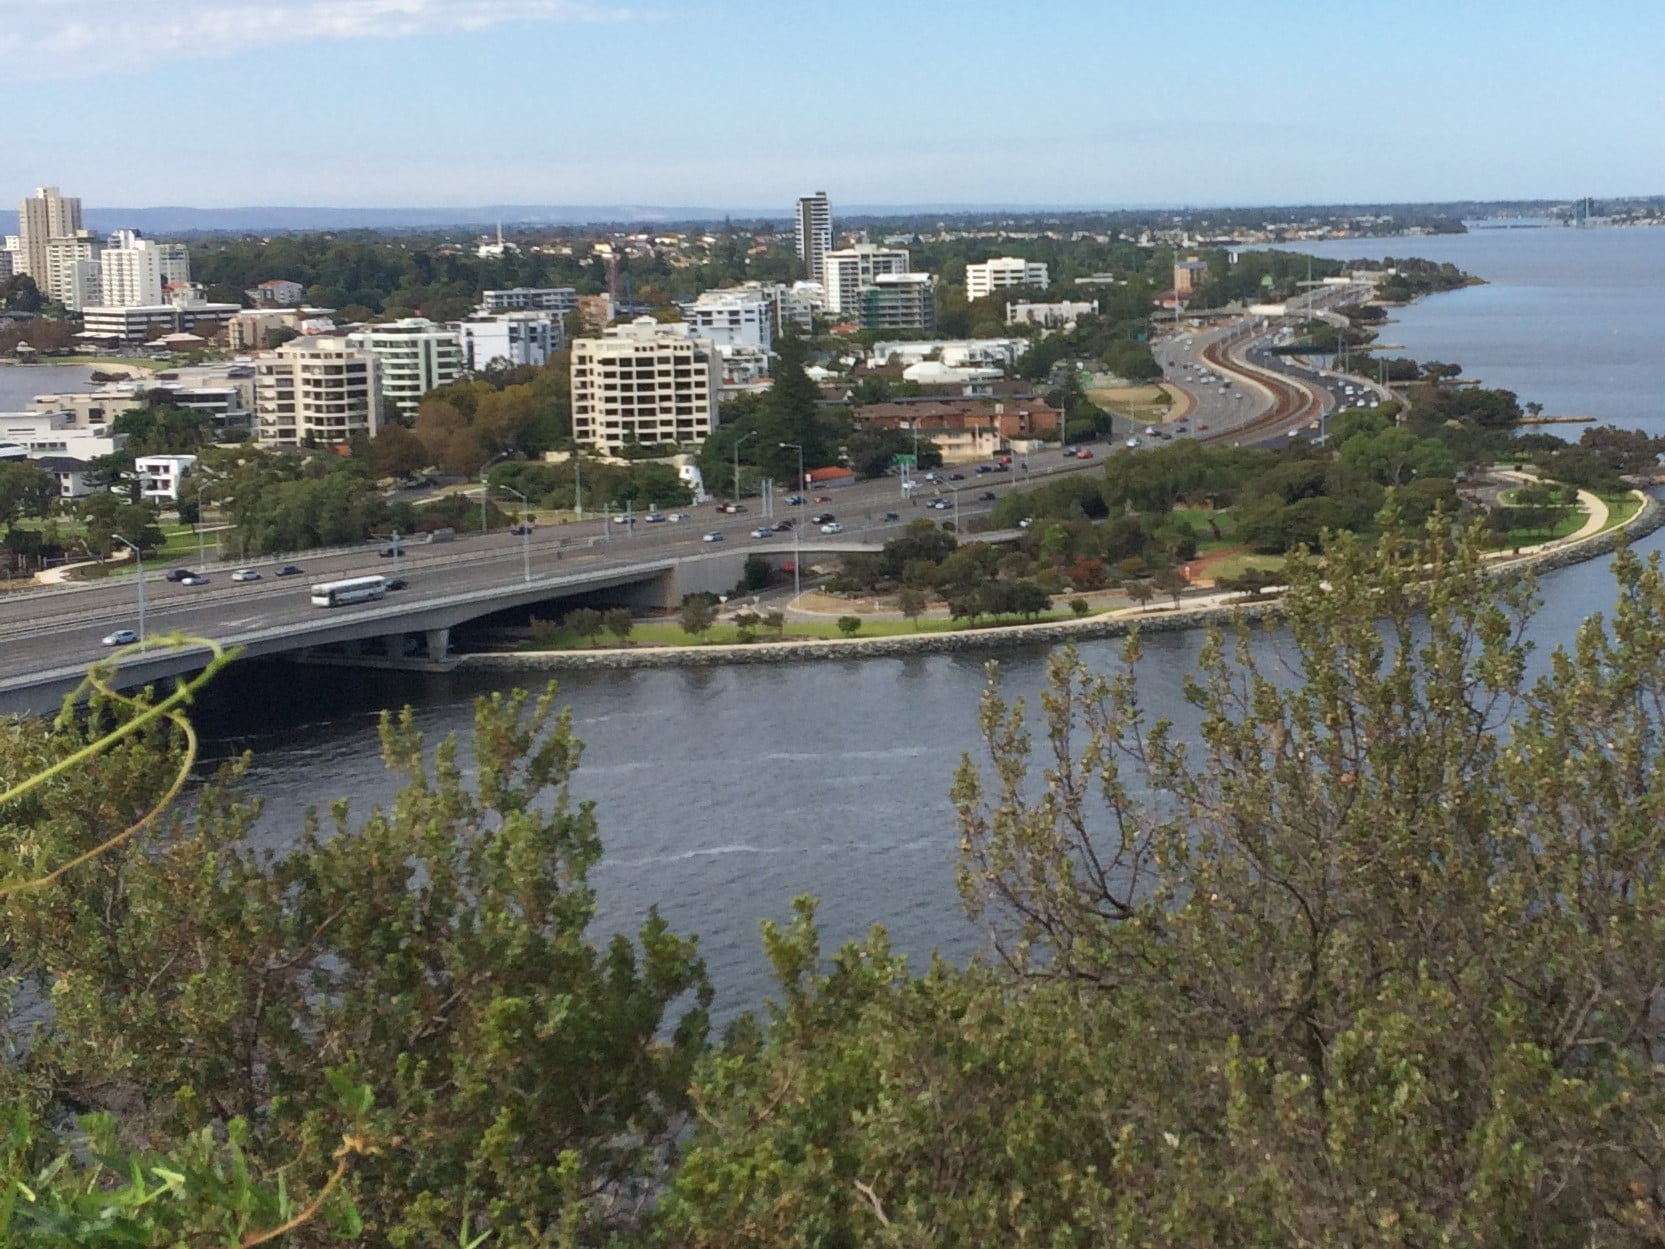 2017-1 - Narrows Bridge, Perth WA